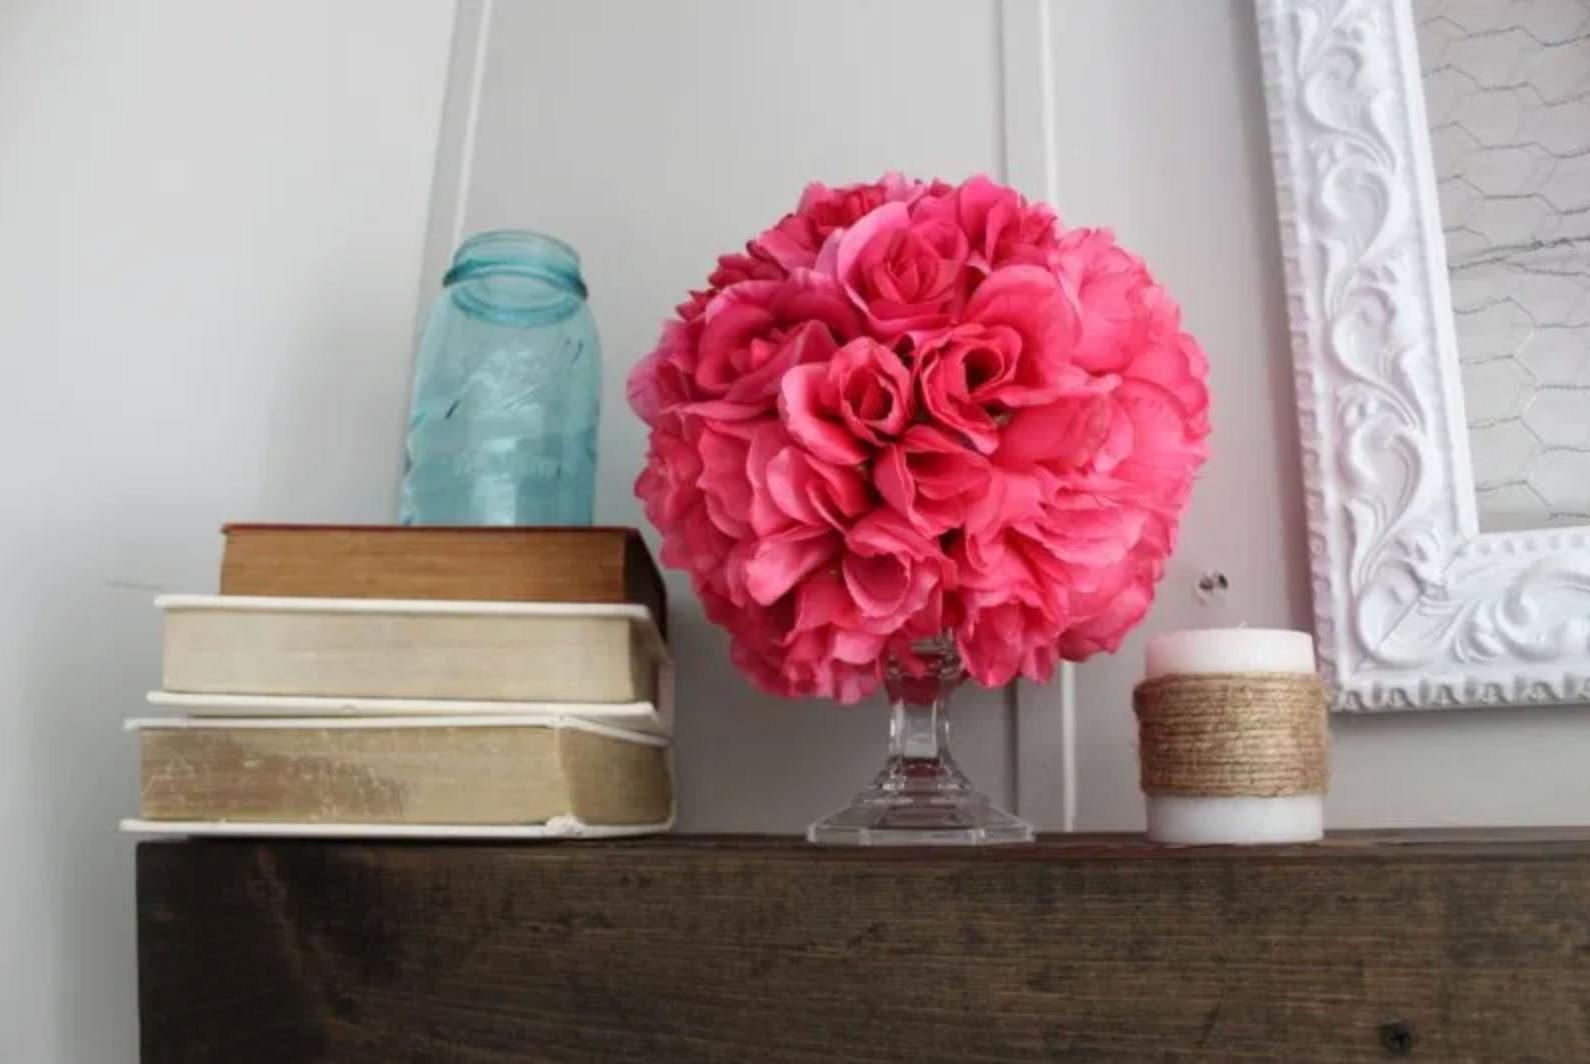 Valentines day flower ball DIY